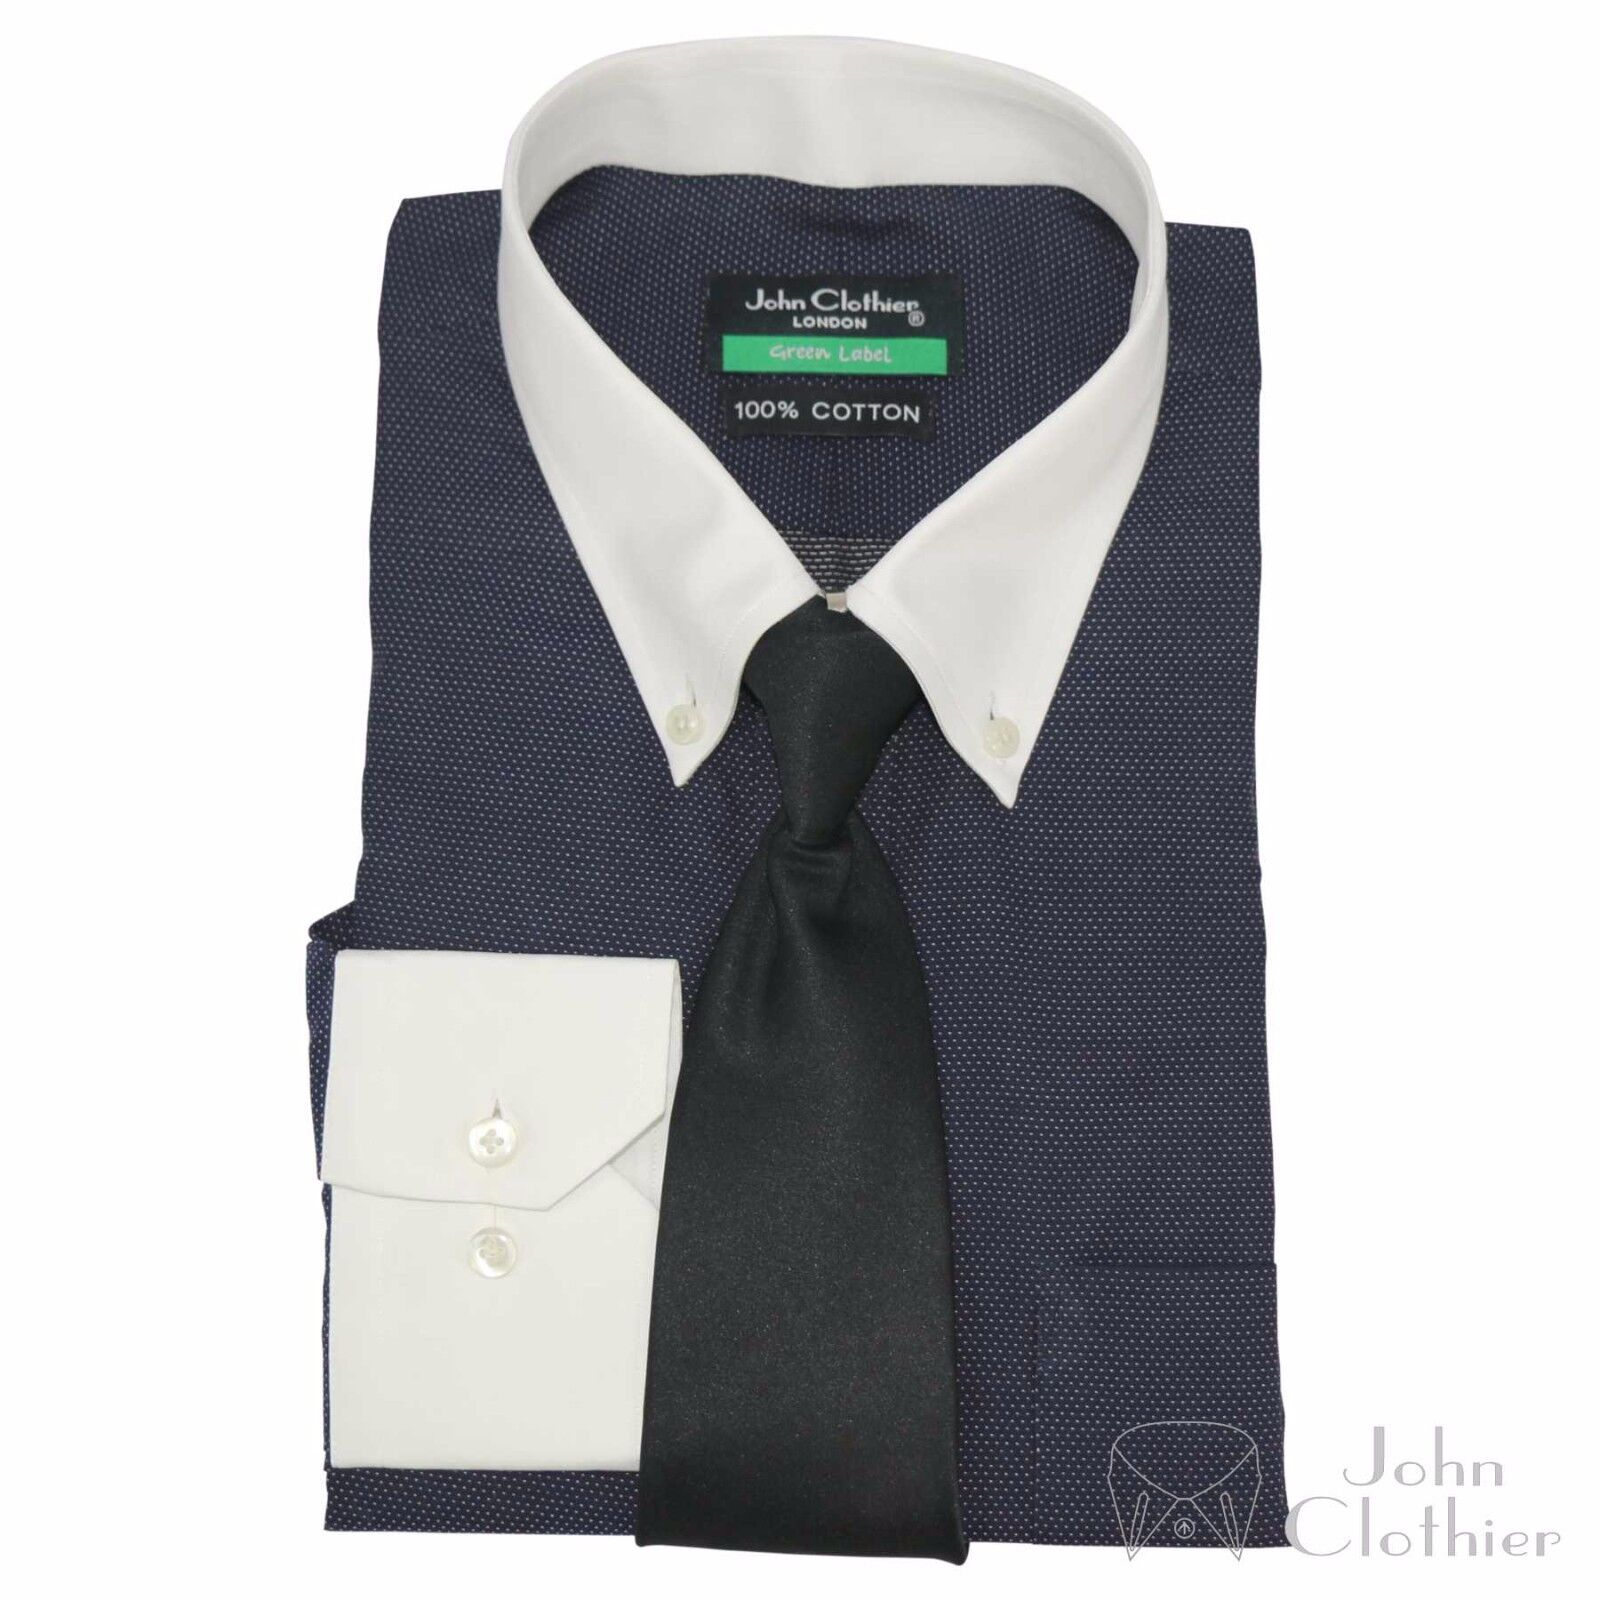 Herren Button Down collar Formal shirt Navy Blau Bankers style shirt for Gents